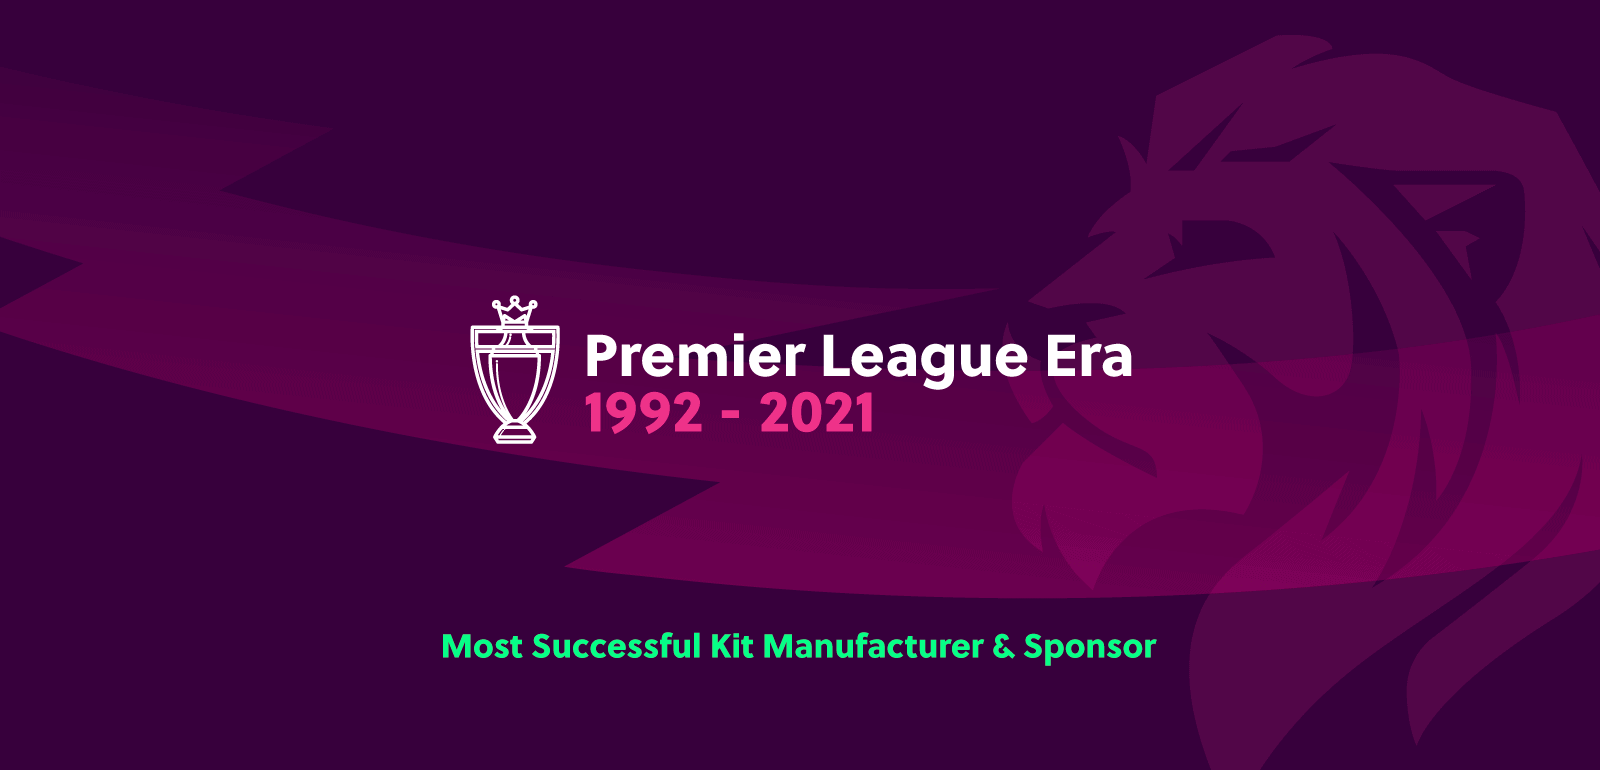 The most successful Premier League Era kit manufacturers unveiled